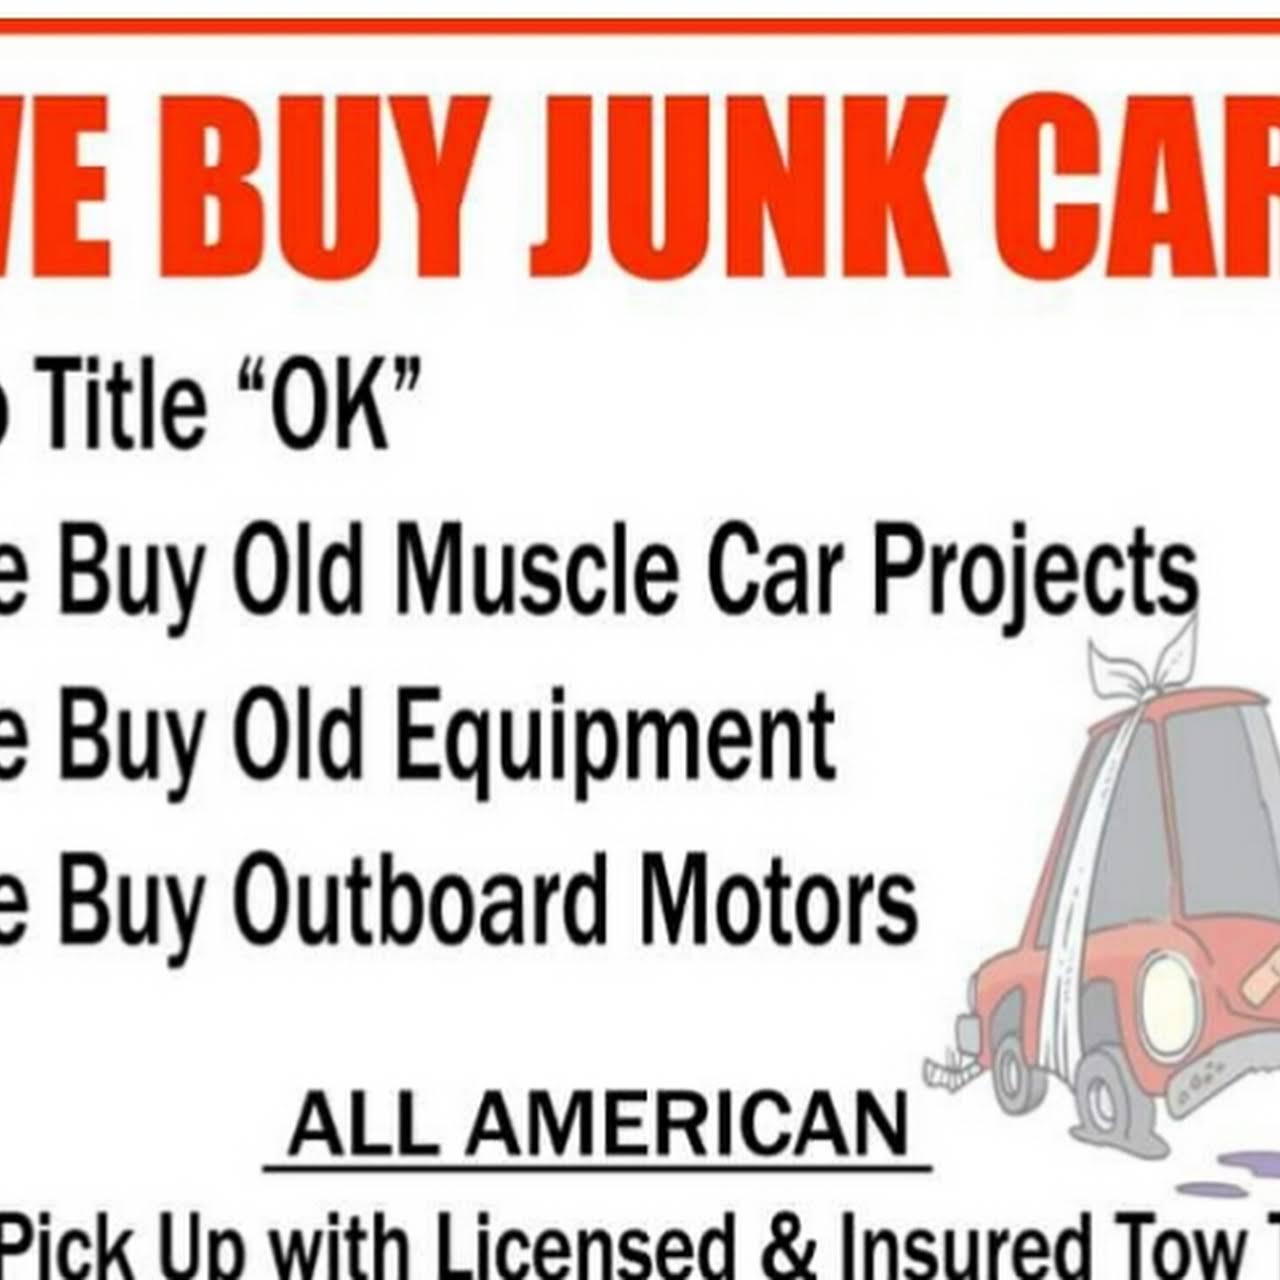 We Buy Junk Cars Trucks - Junkyard in Palm beach gardens